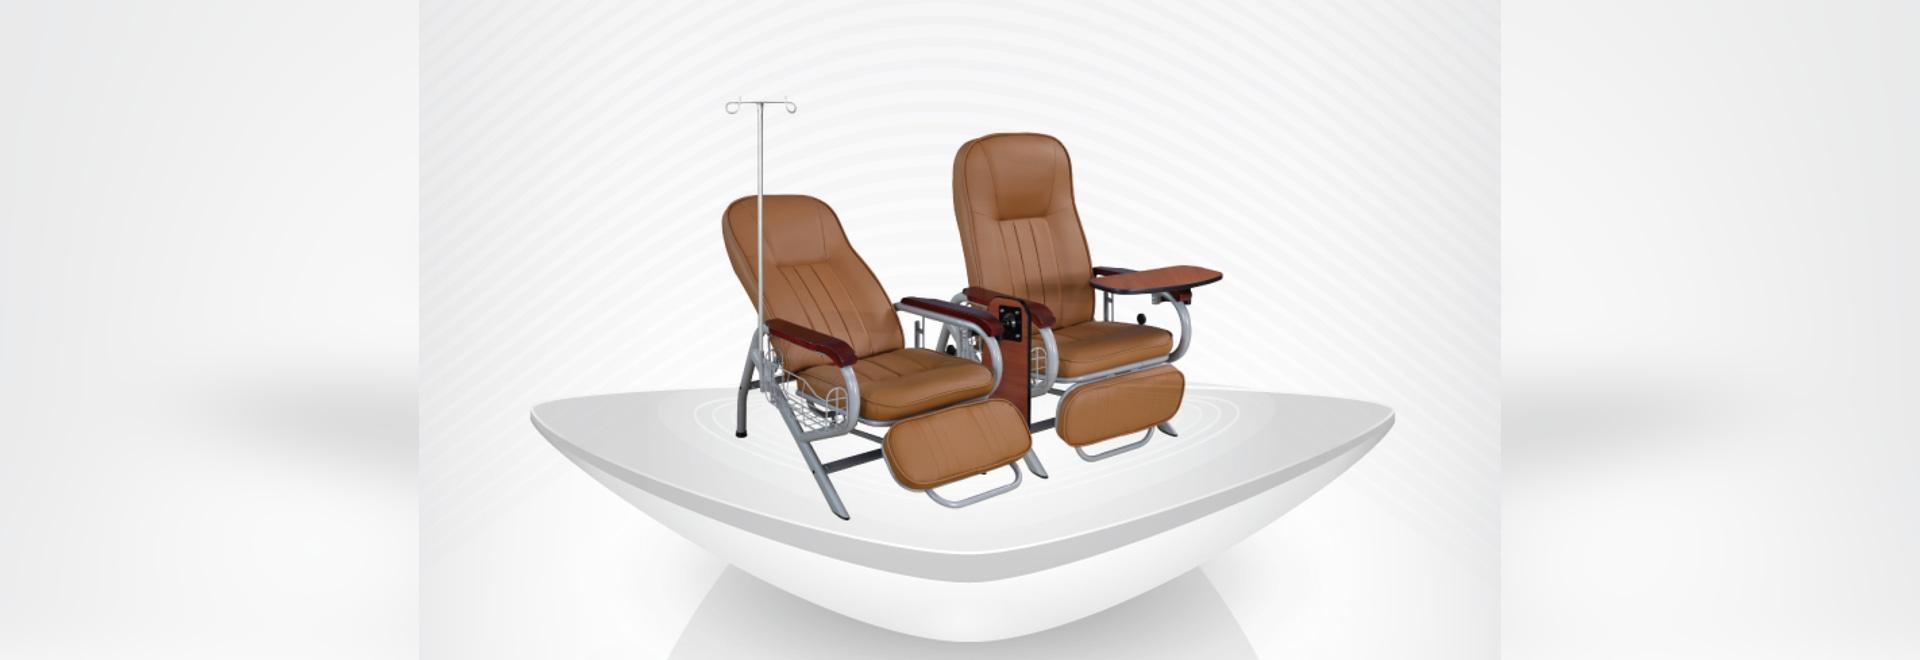 Admirable New Hospital General Use Adjustable And Comfortable Infusion Inzonedesignstudio Interior Chair Design Inzonedesignstudiocom